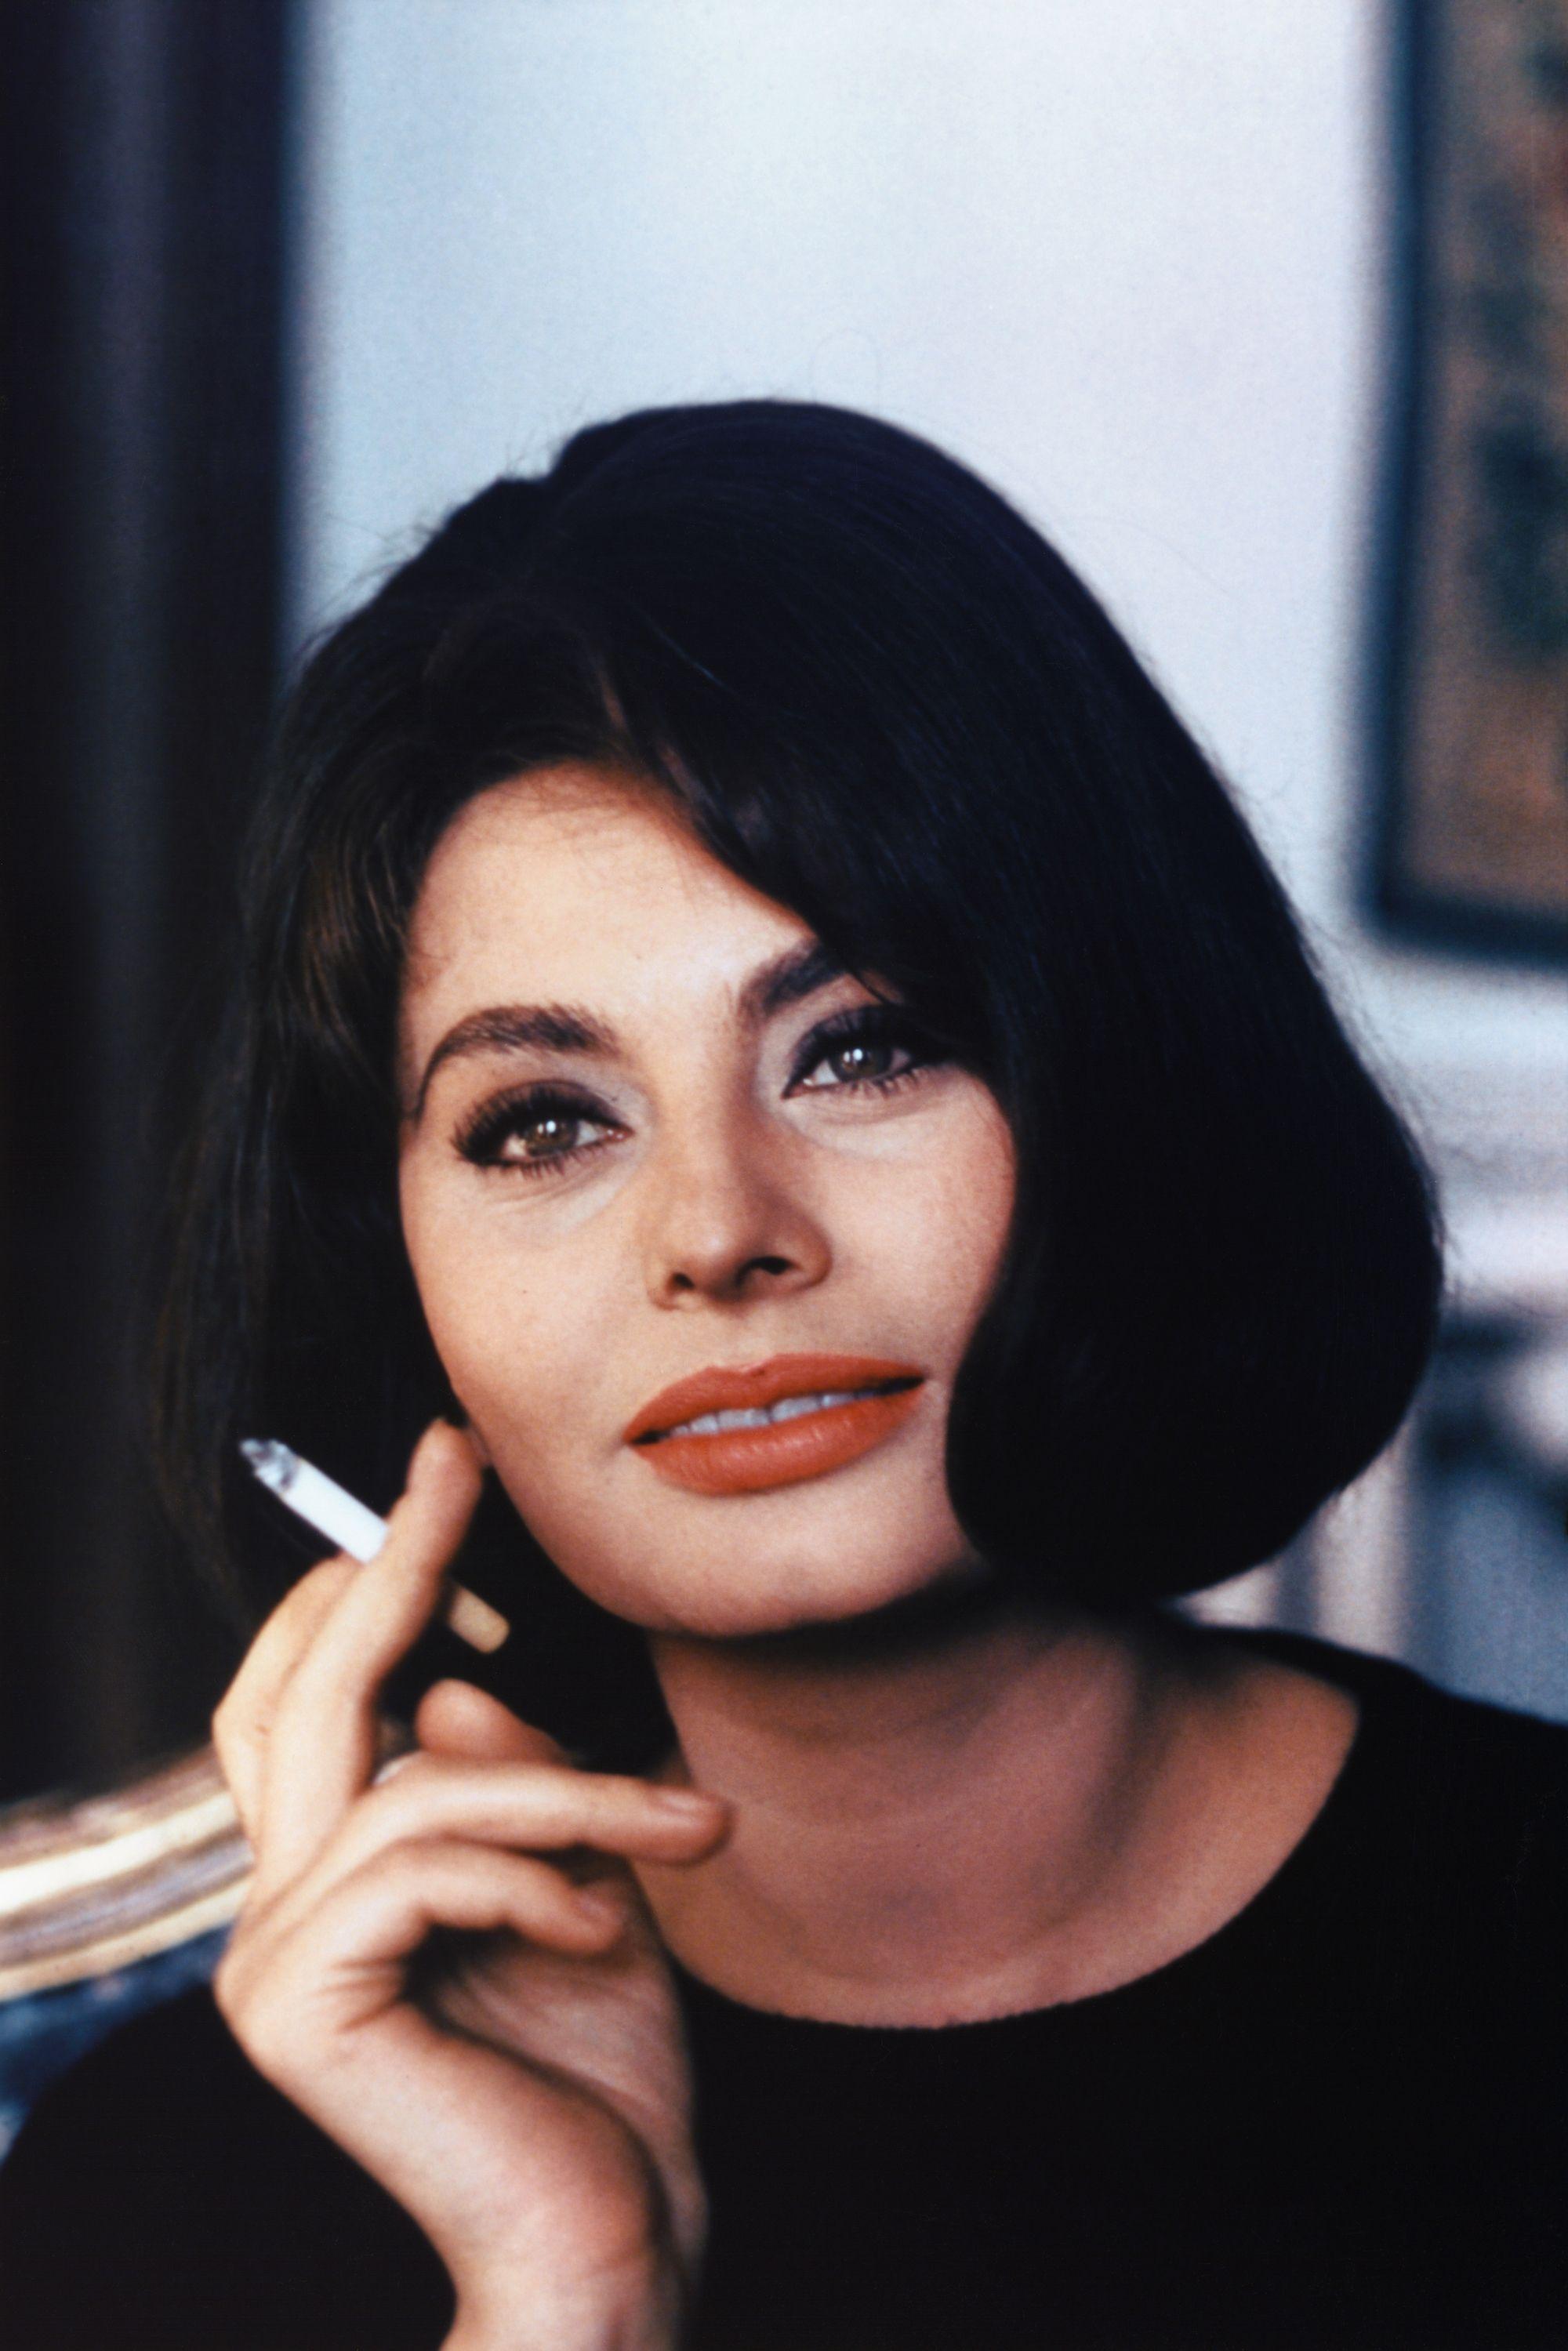 Hollywood stars who smoke cigarettes